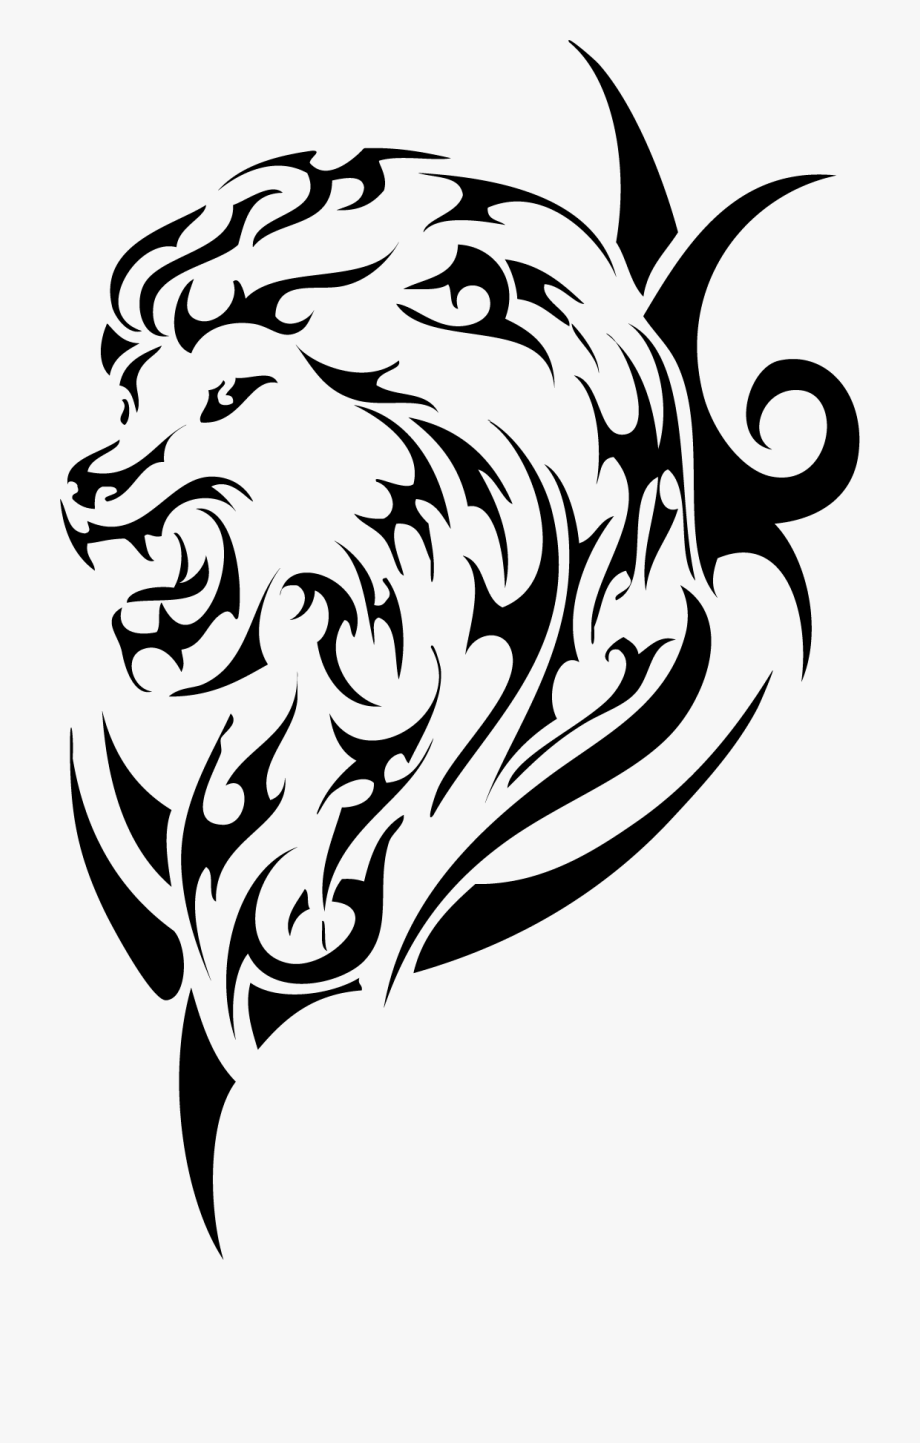 Tattoo Sleeve Artist Nz Lion Studio Ink Clipart.